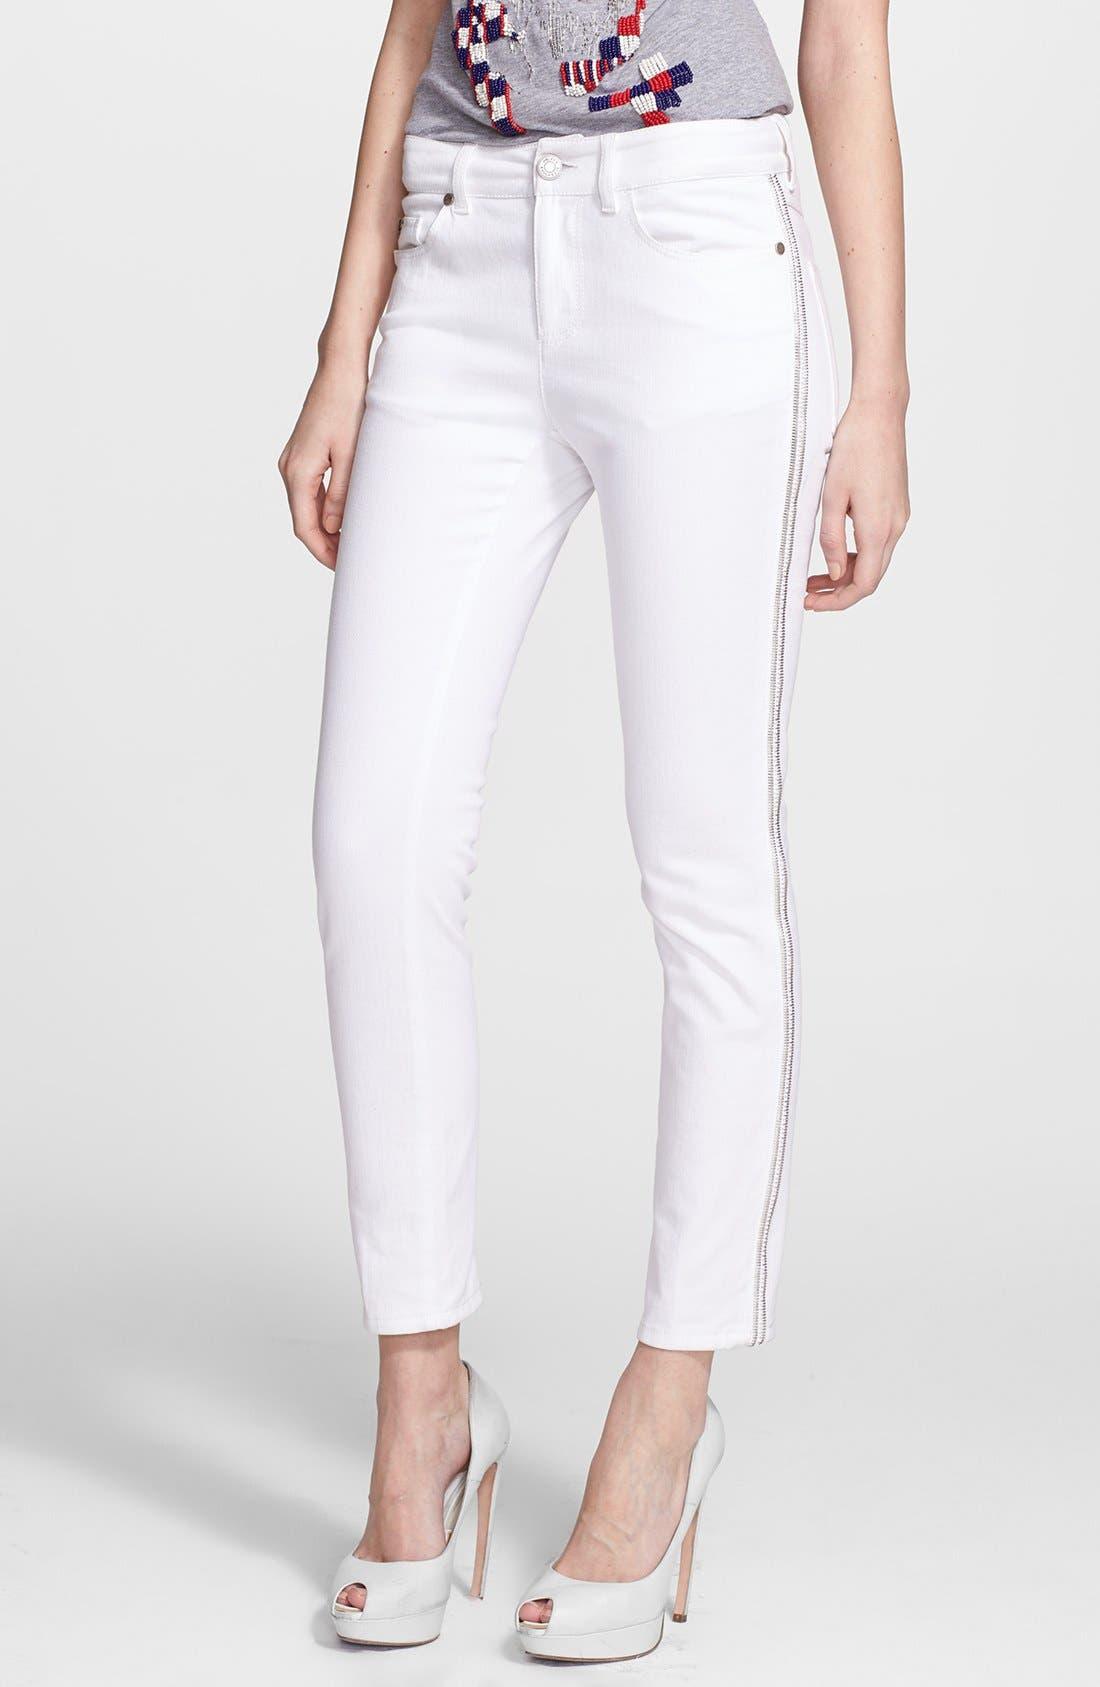 Main Image - Alexander McQueen Zip Detail Skinny Ankle Jeans